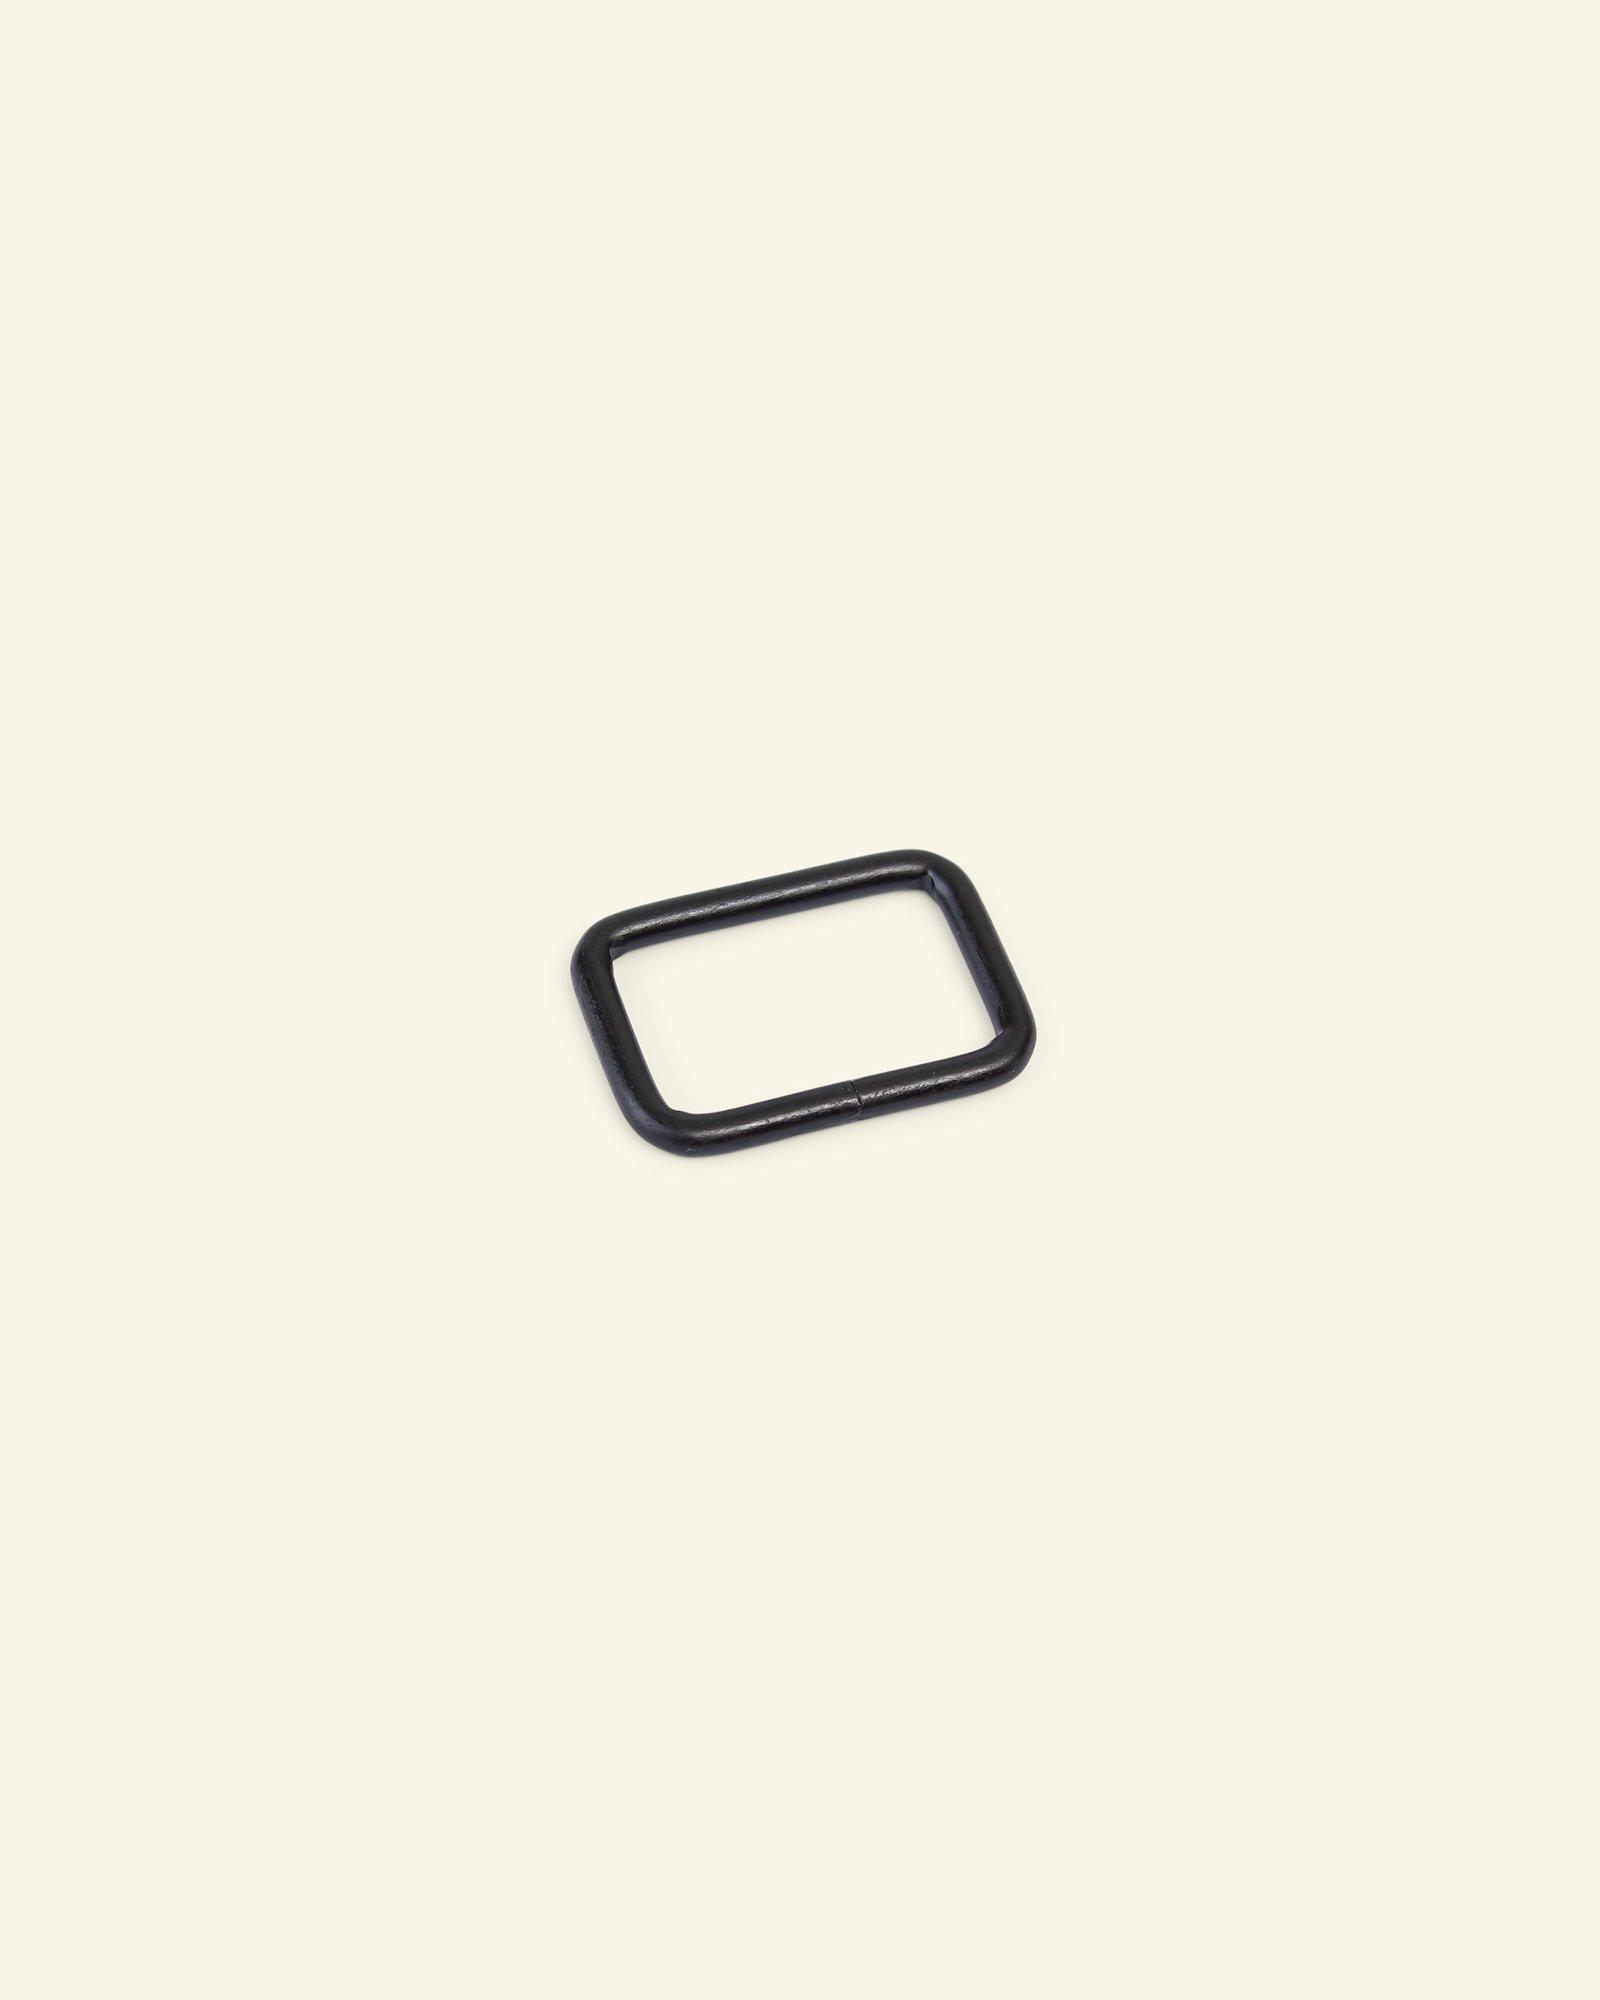 Ring square metal 32x20mm matt black 1pc